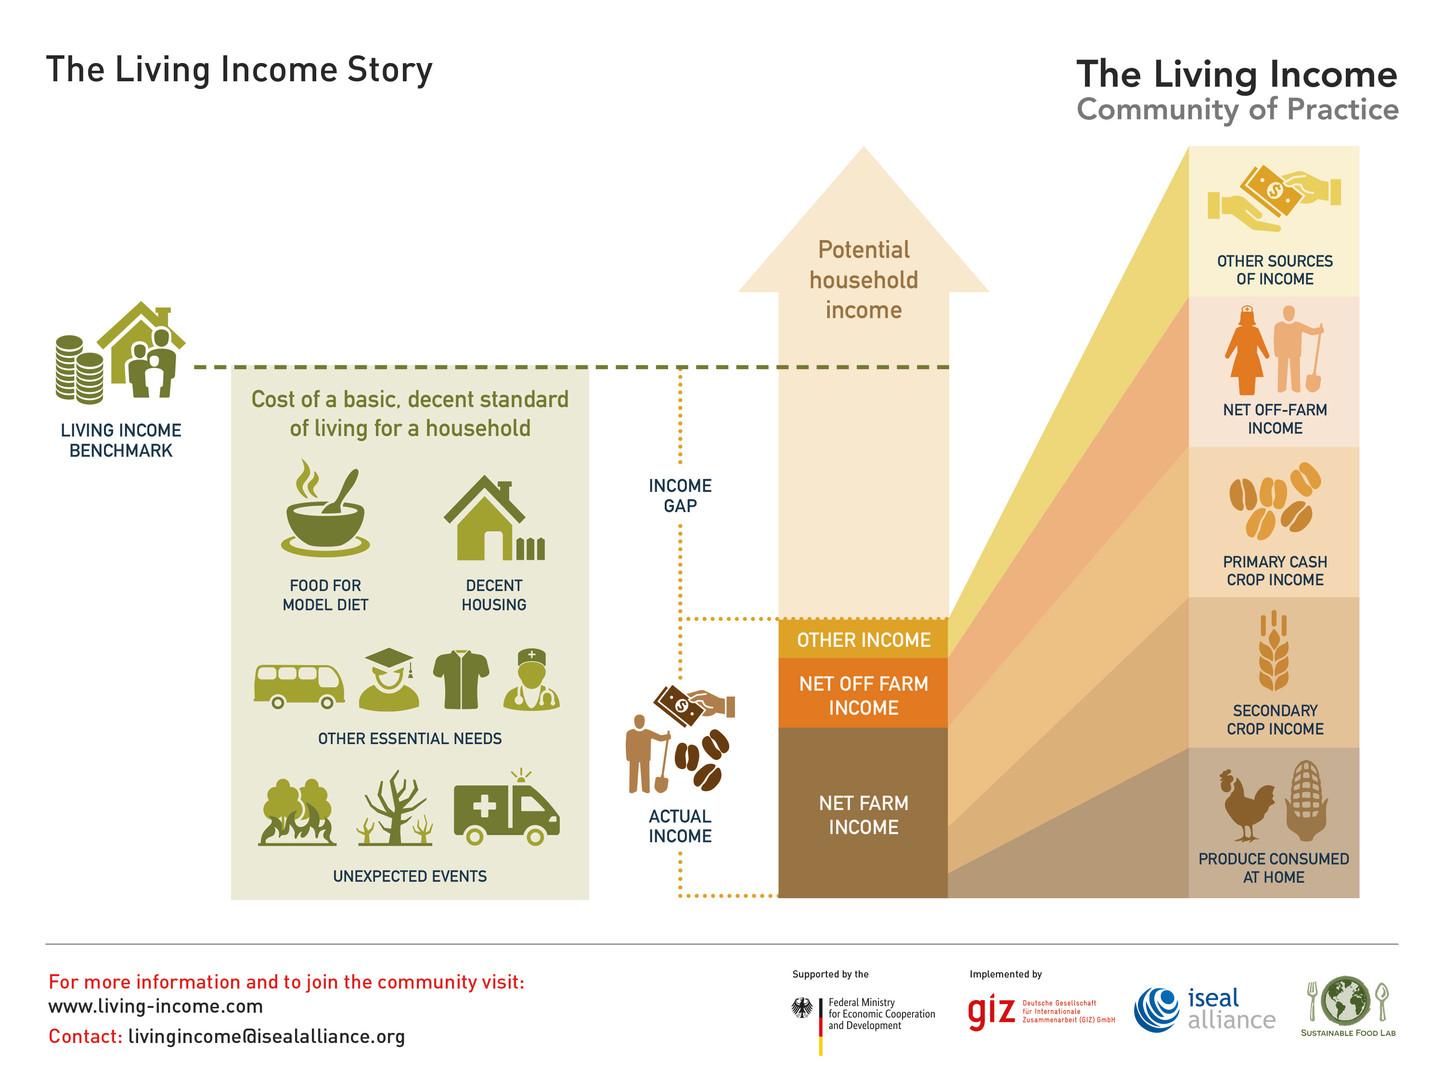 The Living Income Story - 2019 ©LivingIncomeCommunityofPractice